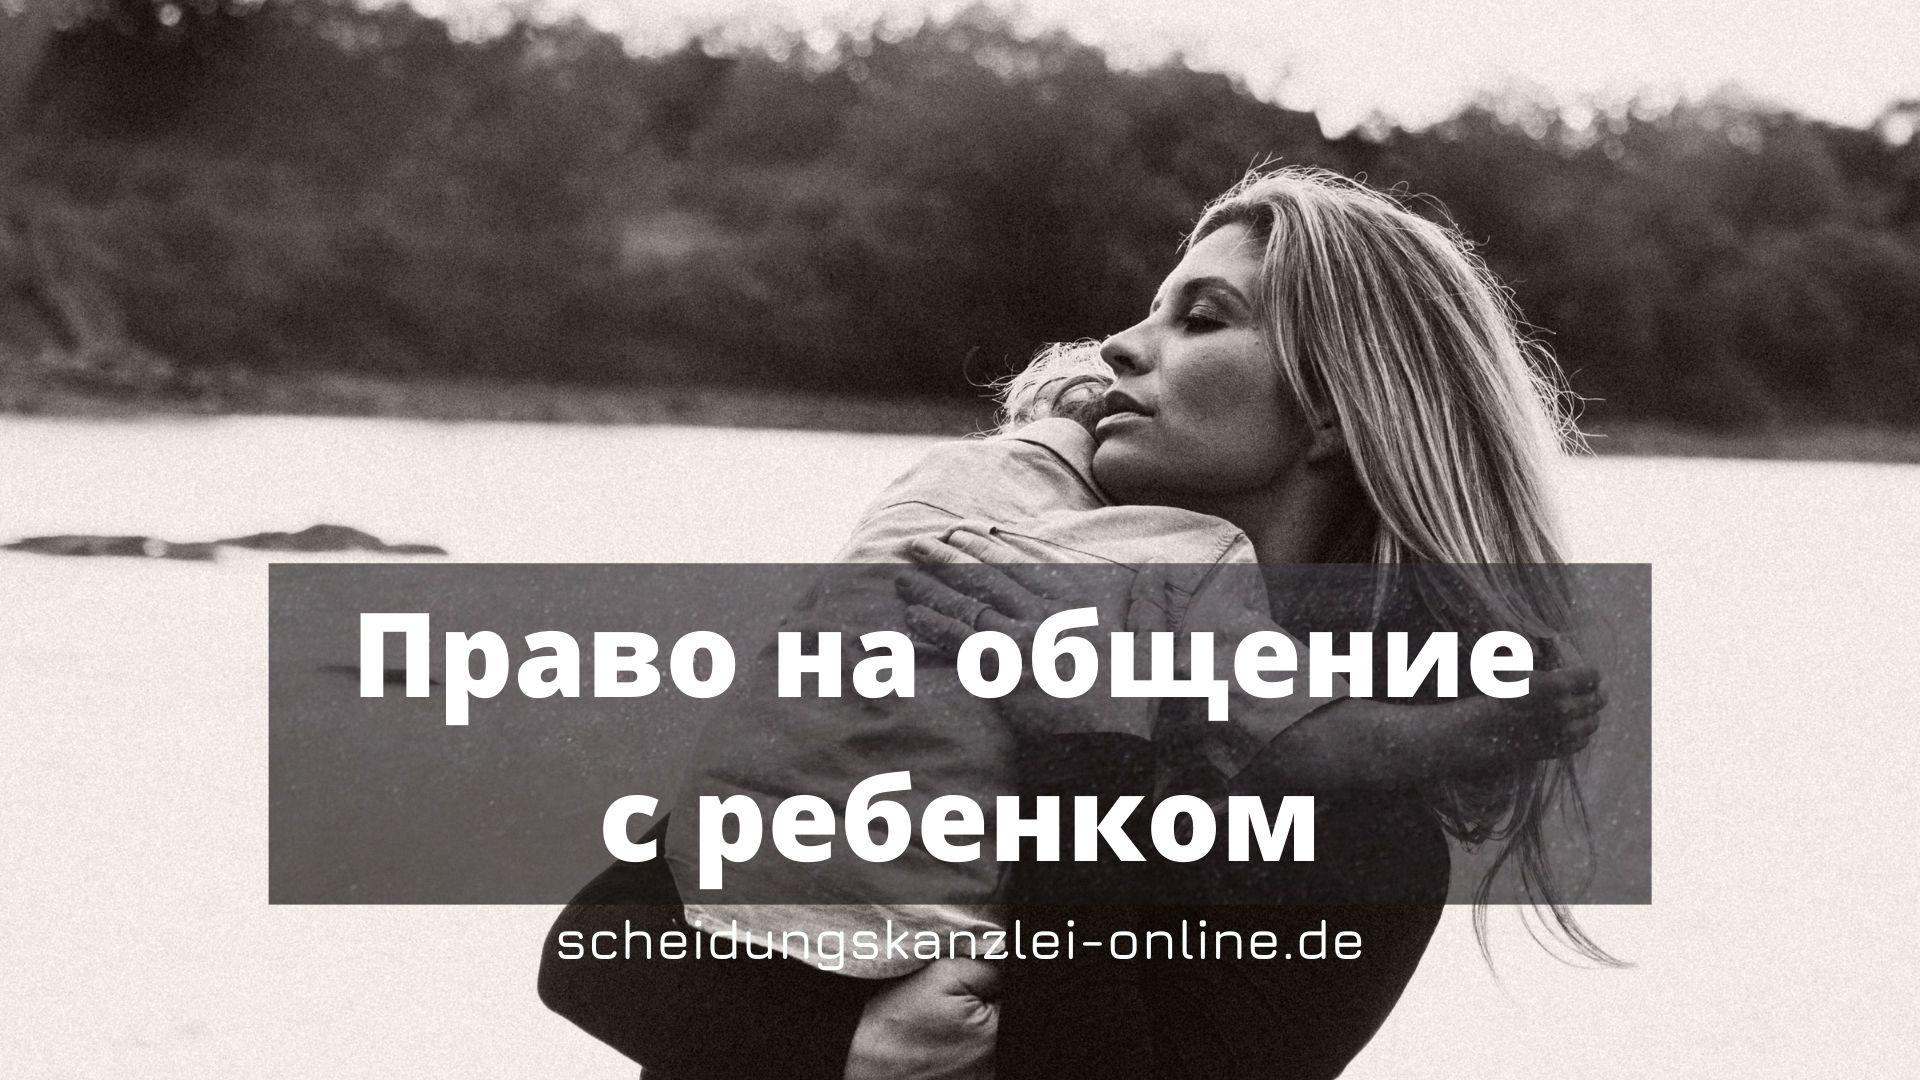 Права родителей на общение с ребенком